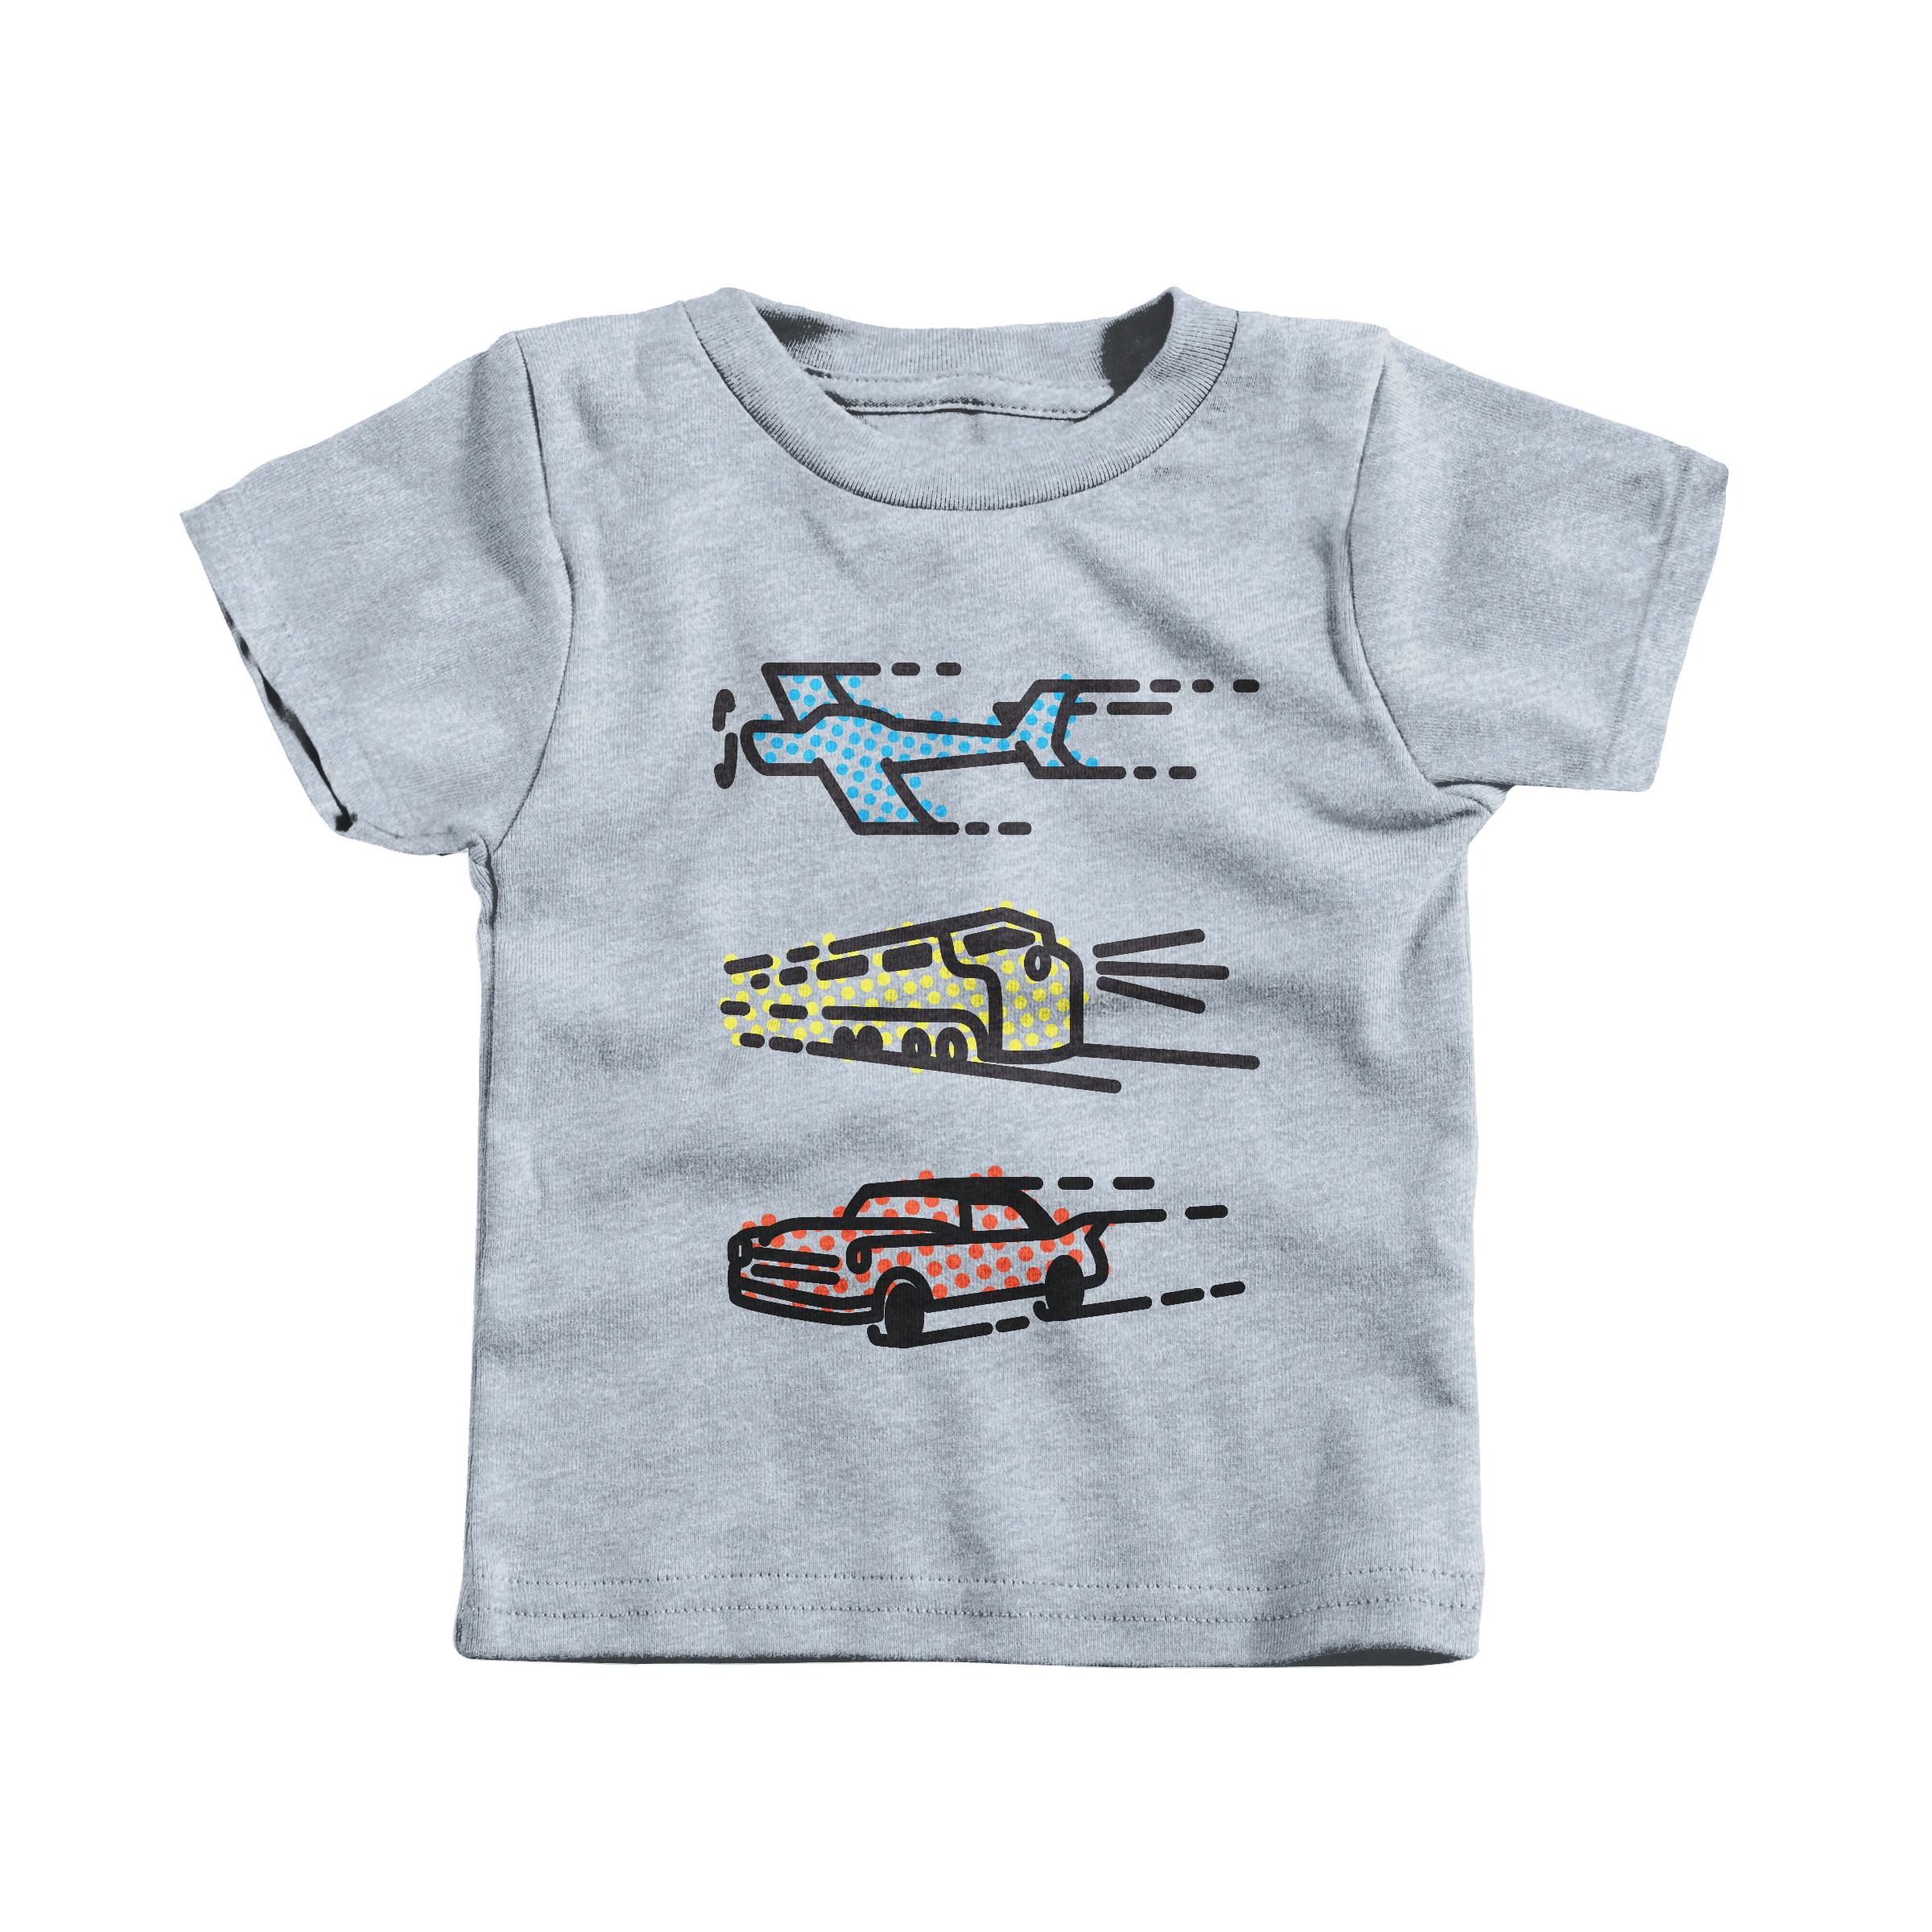 Plane, Train & Automobile Heather Grey (Infant)